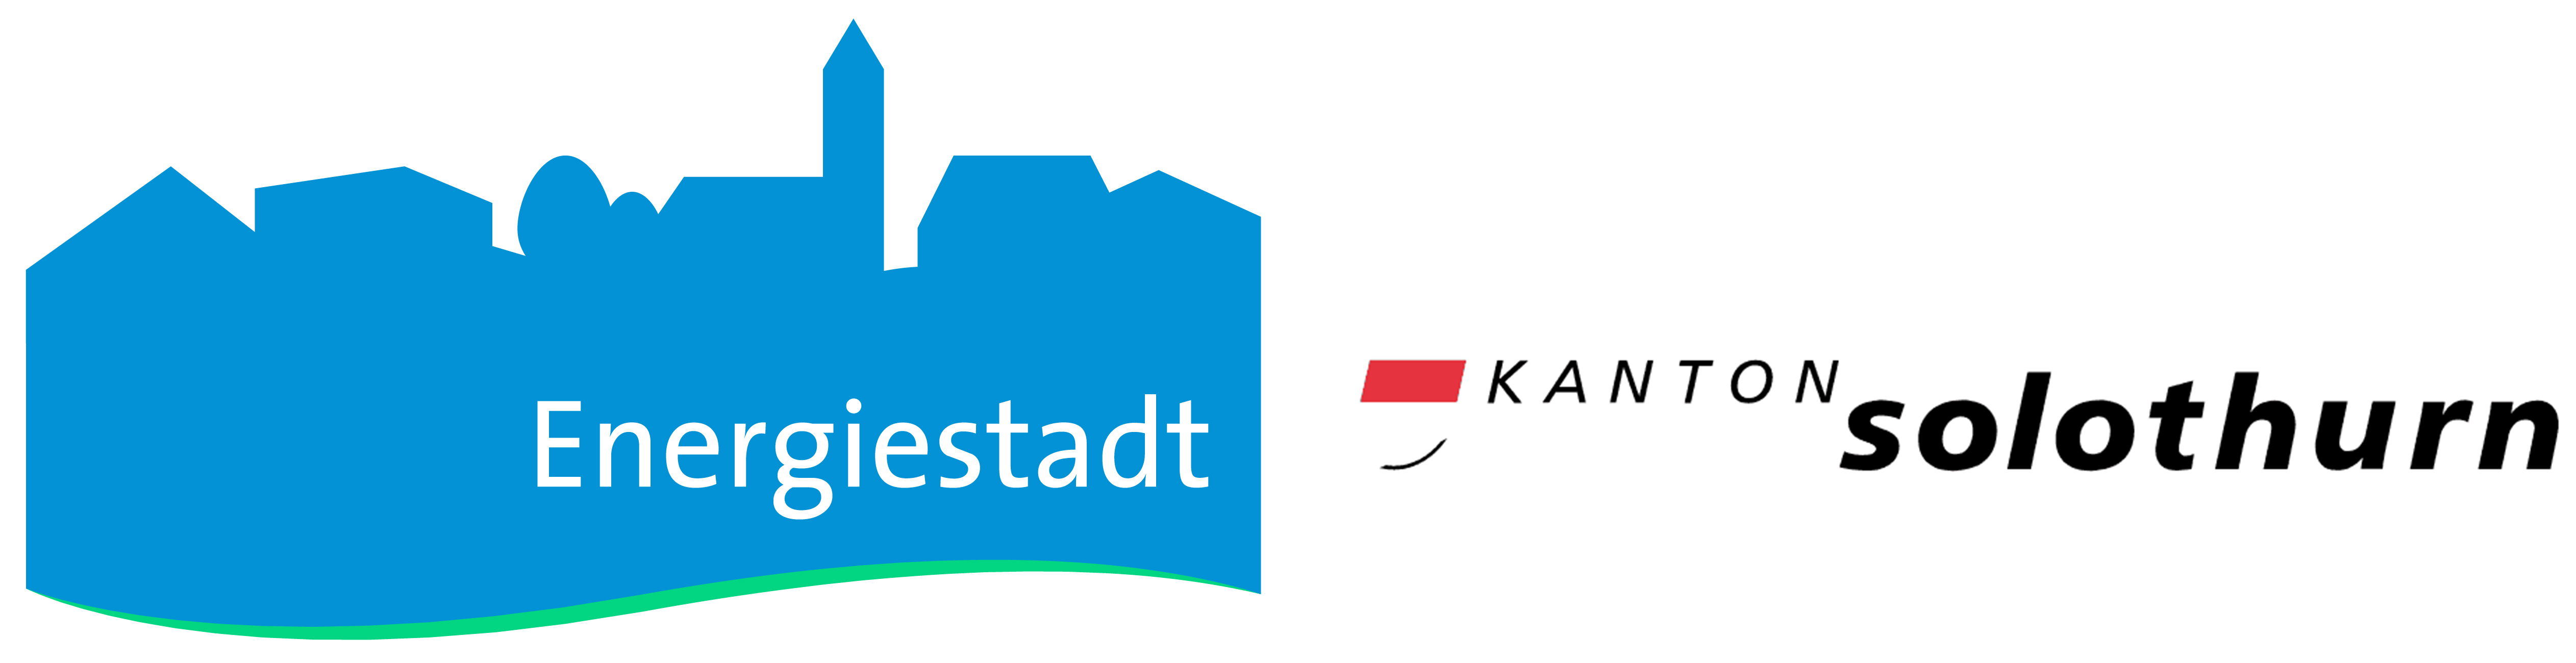 Netzwerk Energiestadte Kanton Solothurn